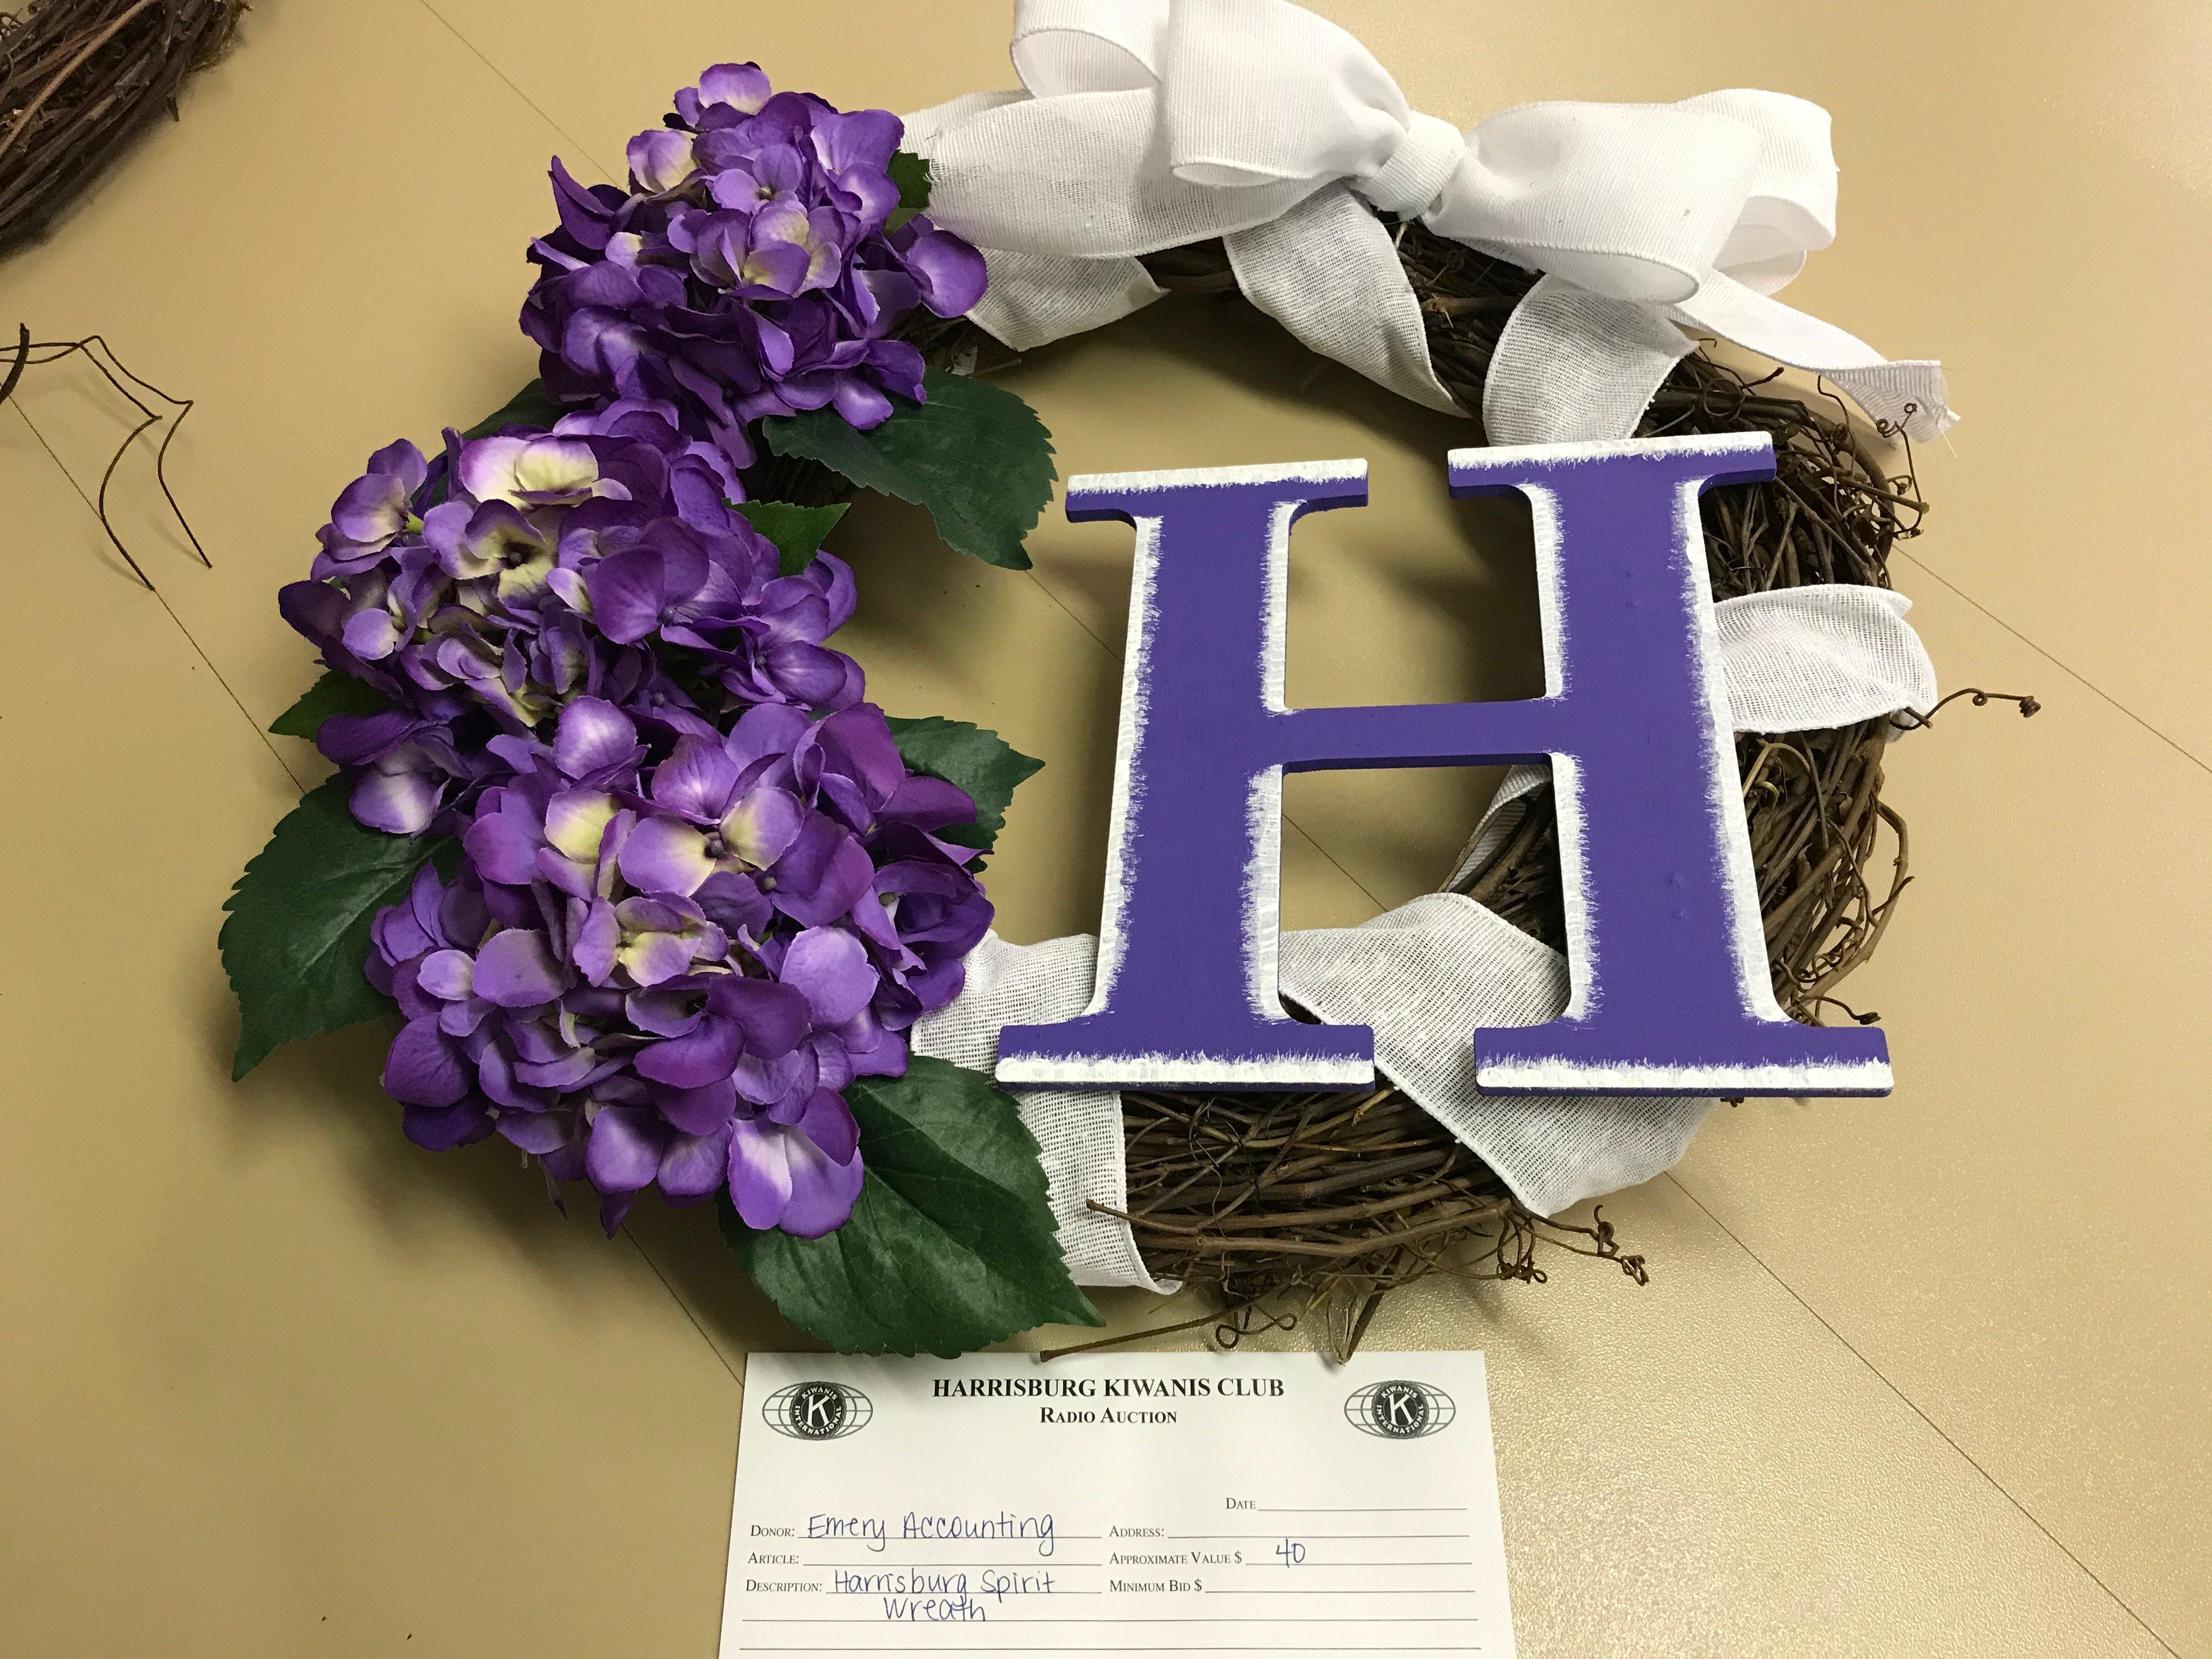 Item 407 - Emery Accounting Harrisburg Spirit Wreath